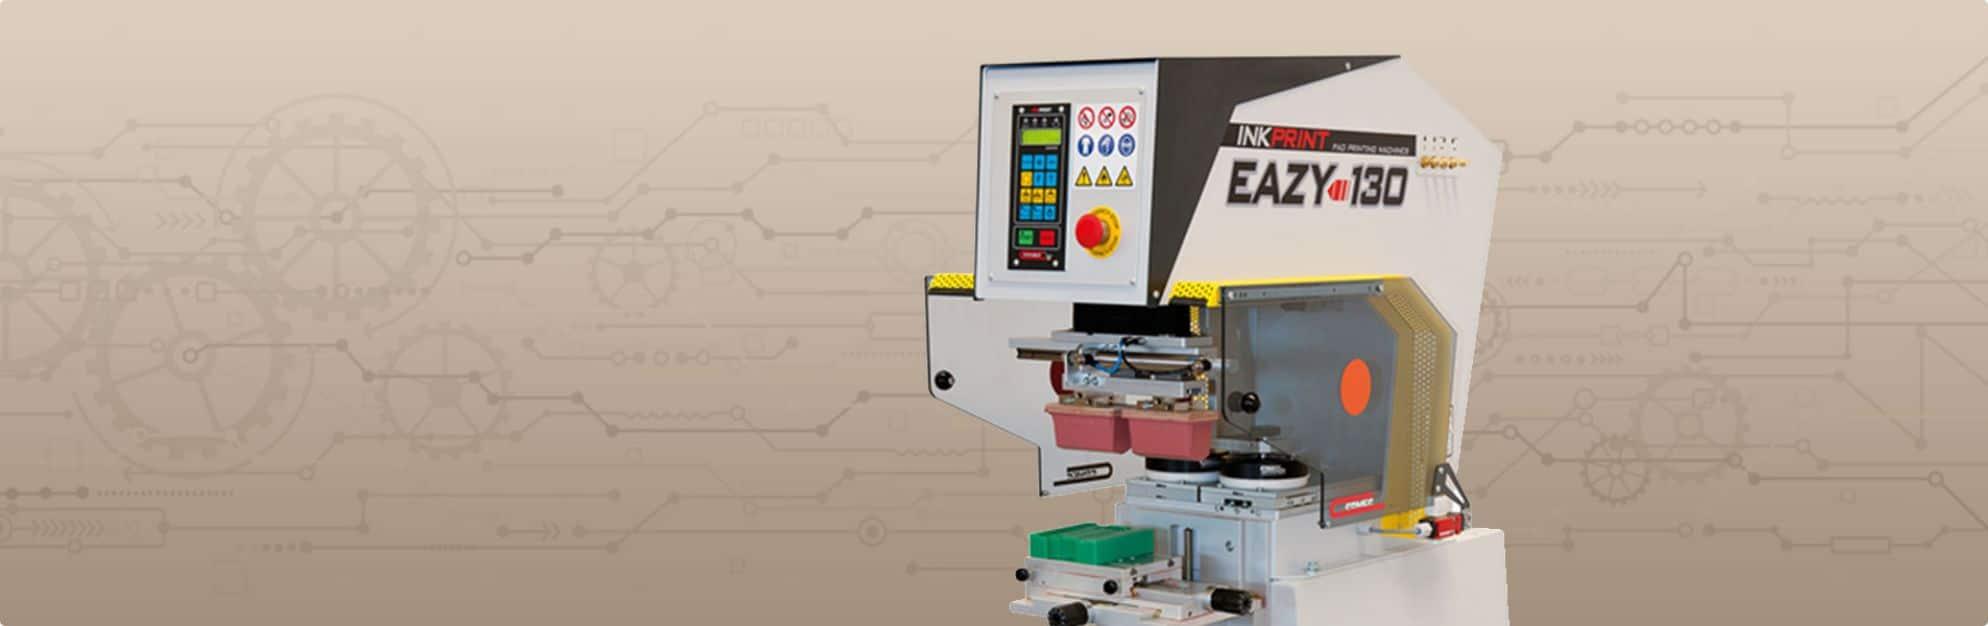 The EAZY 130 Pad Printing Machine